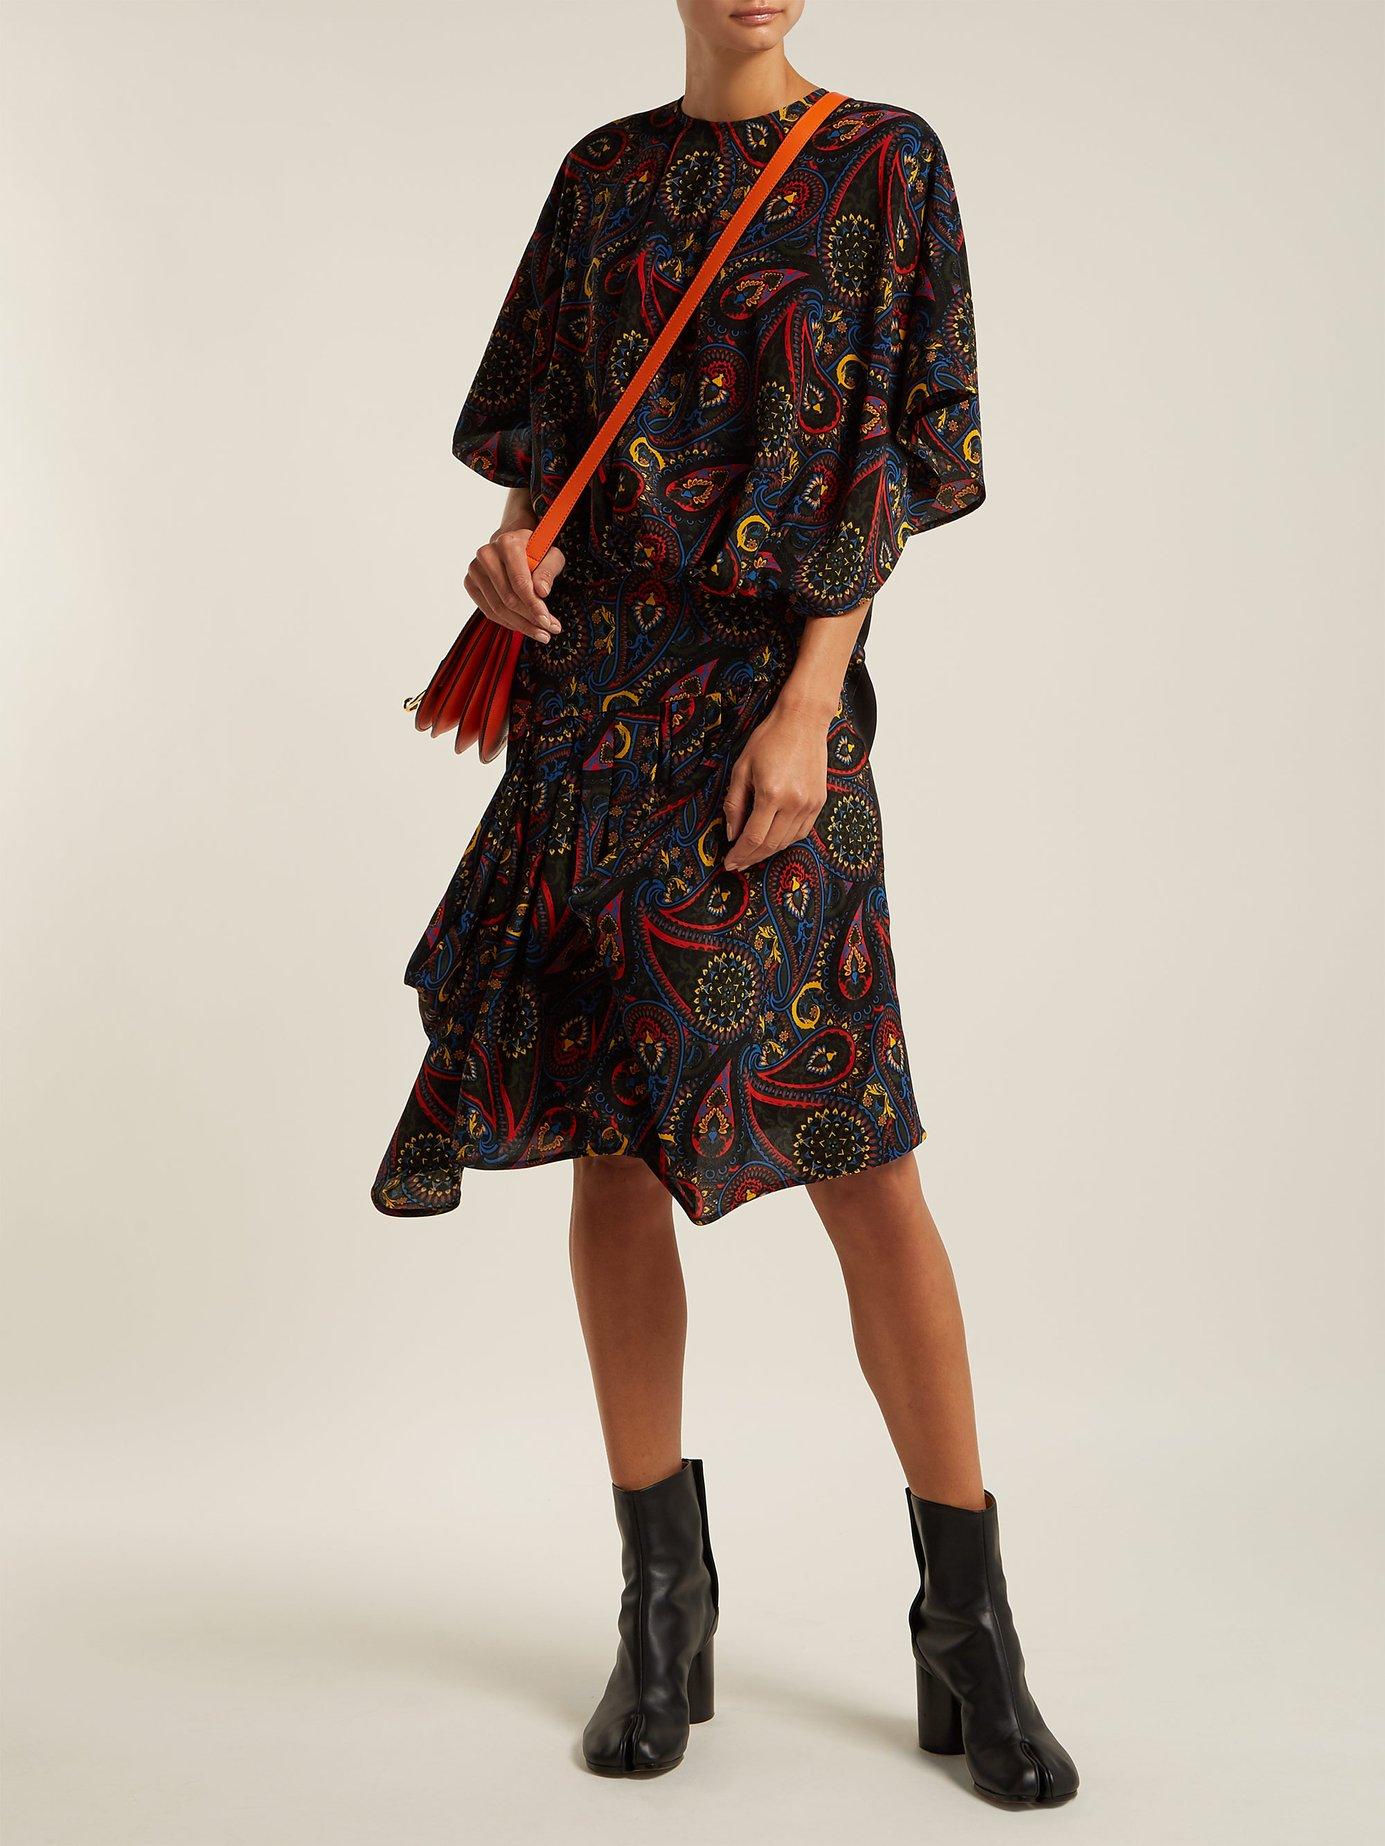 Paisley-print handkerchief-hem silk dress by Jw Anderson